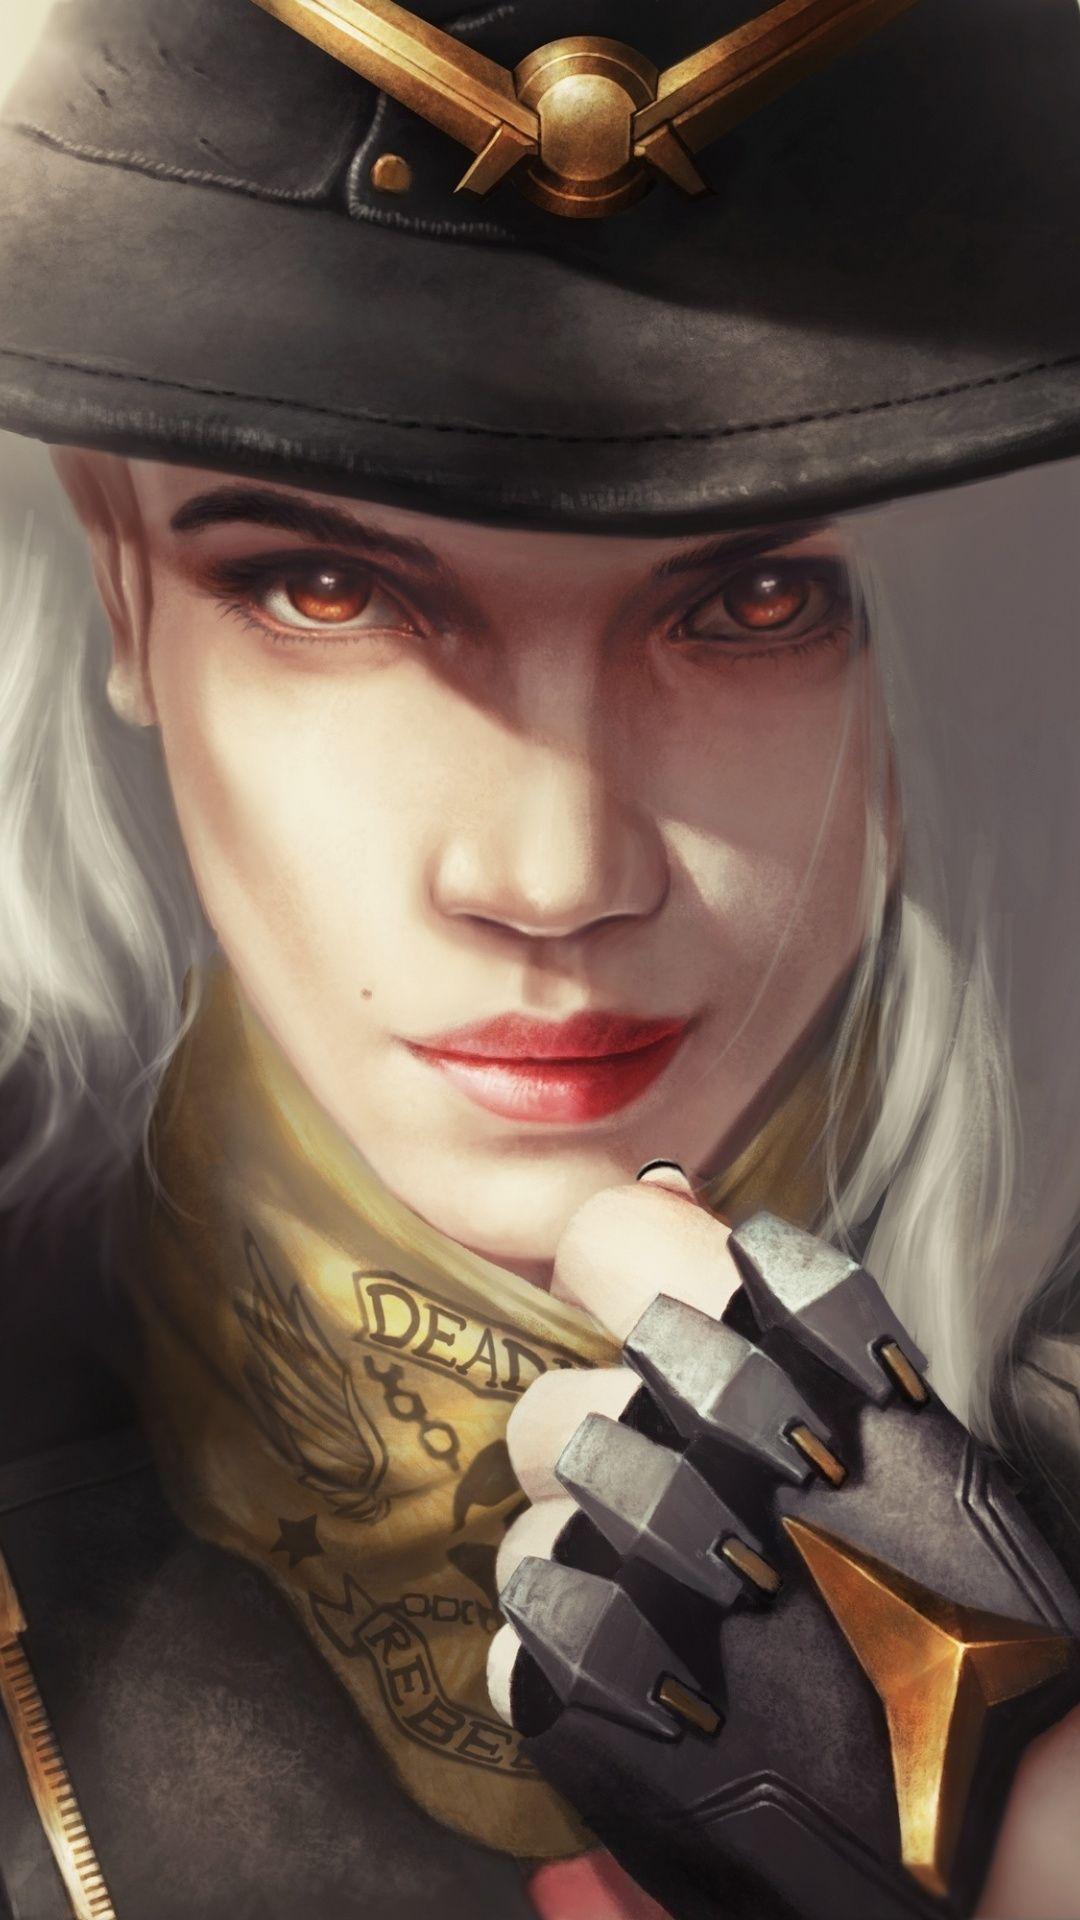 Ashe, warrior, overwatch, online game, 1080x1920 wallpaper